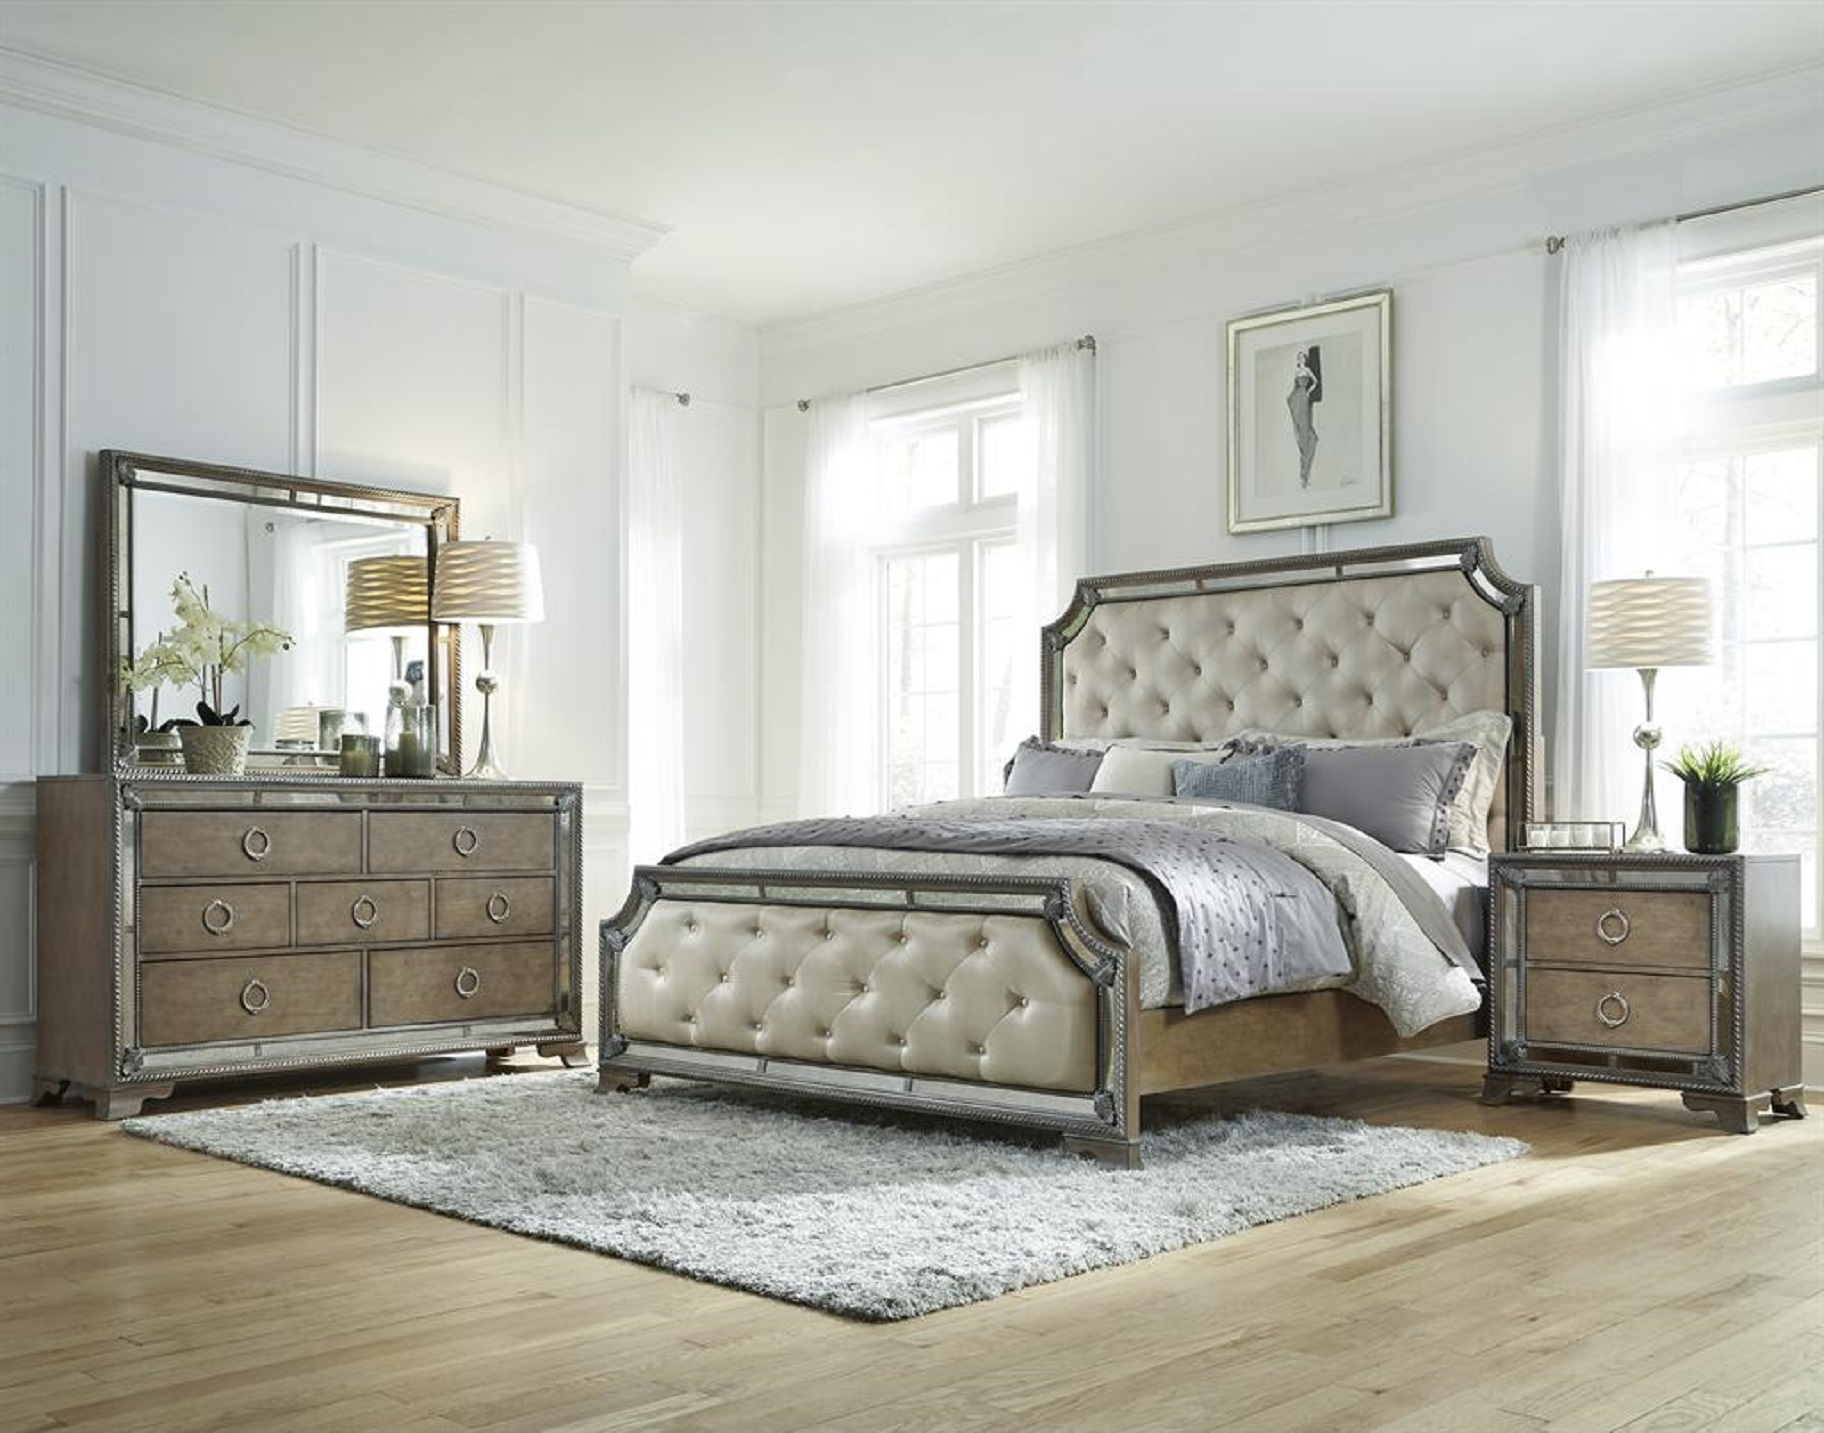 mirrored bedroom furniture set photo - 2